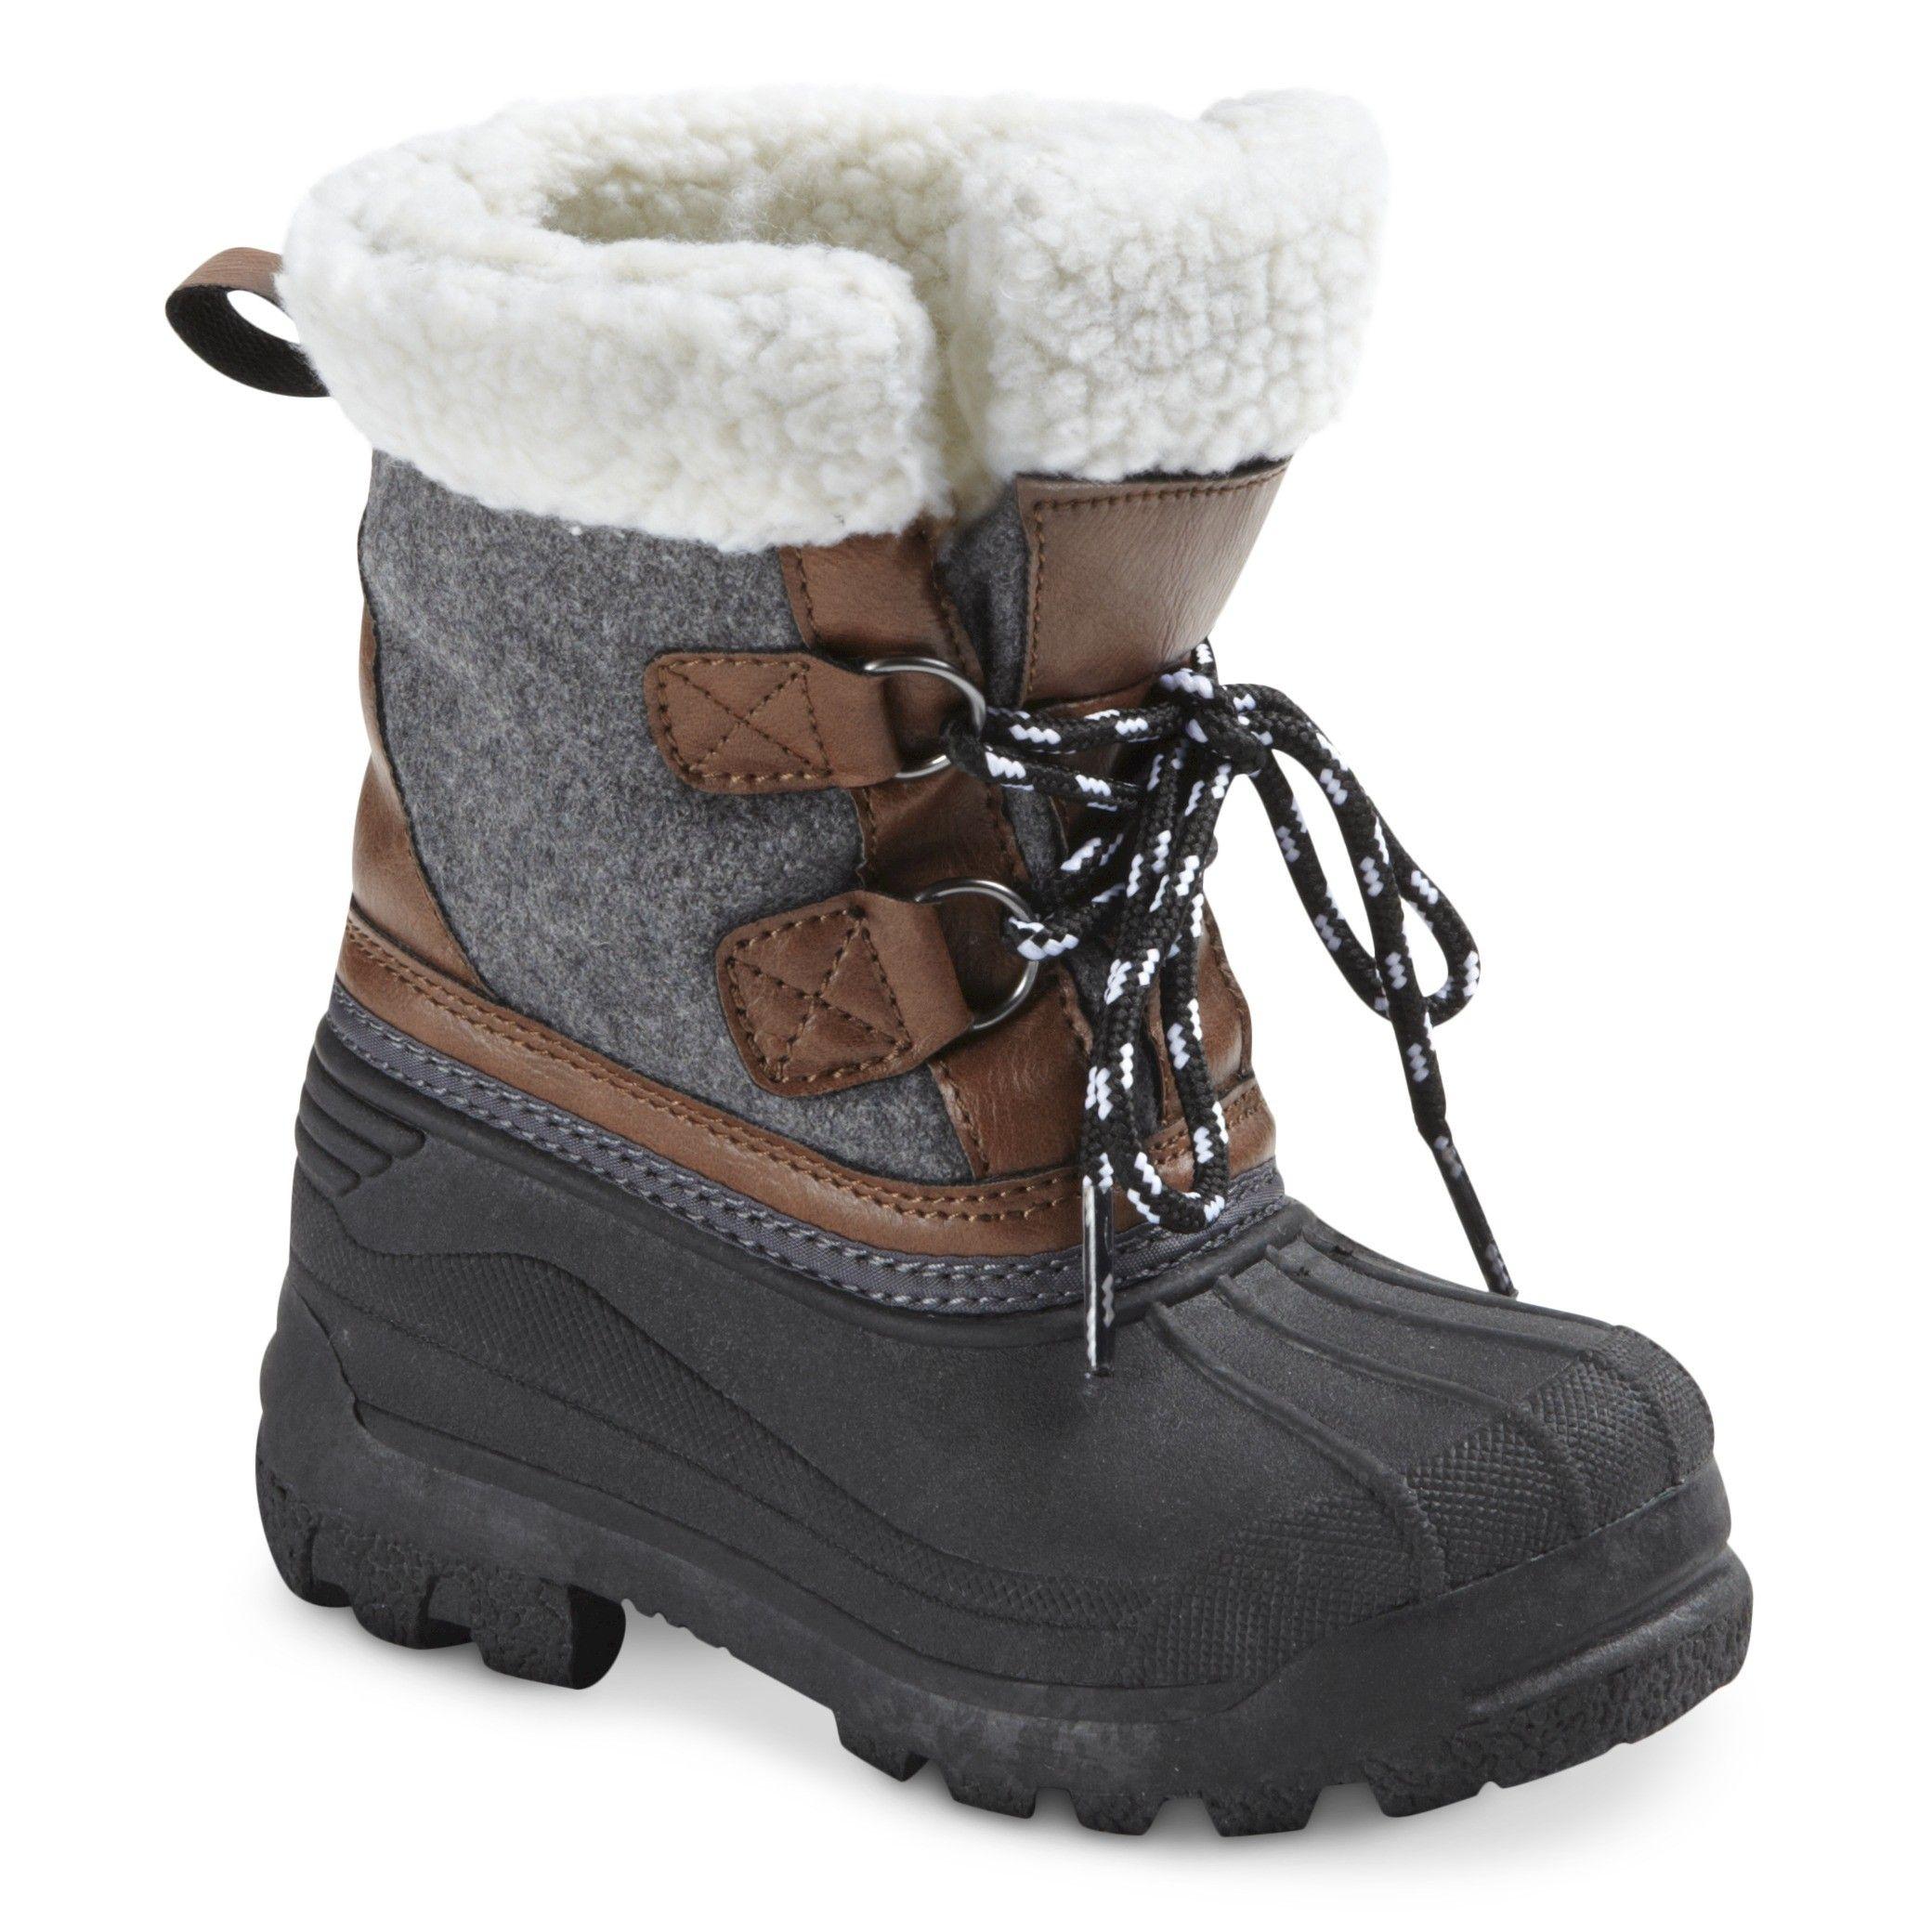 Toddler boy fashion, Toddler rain boots